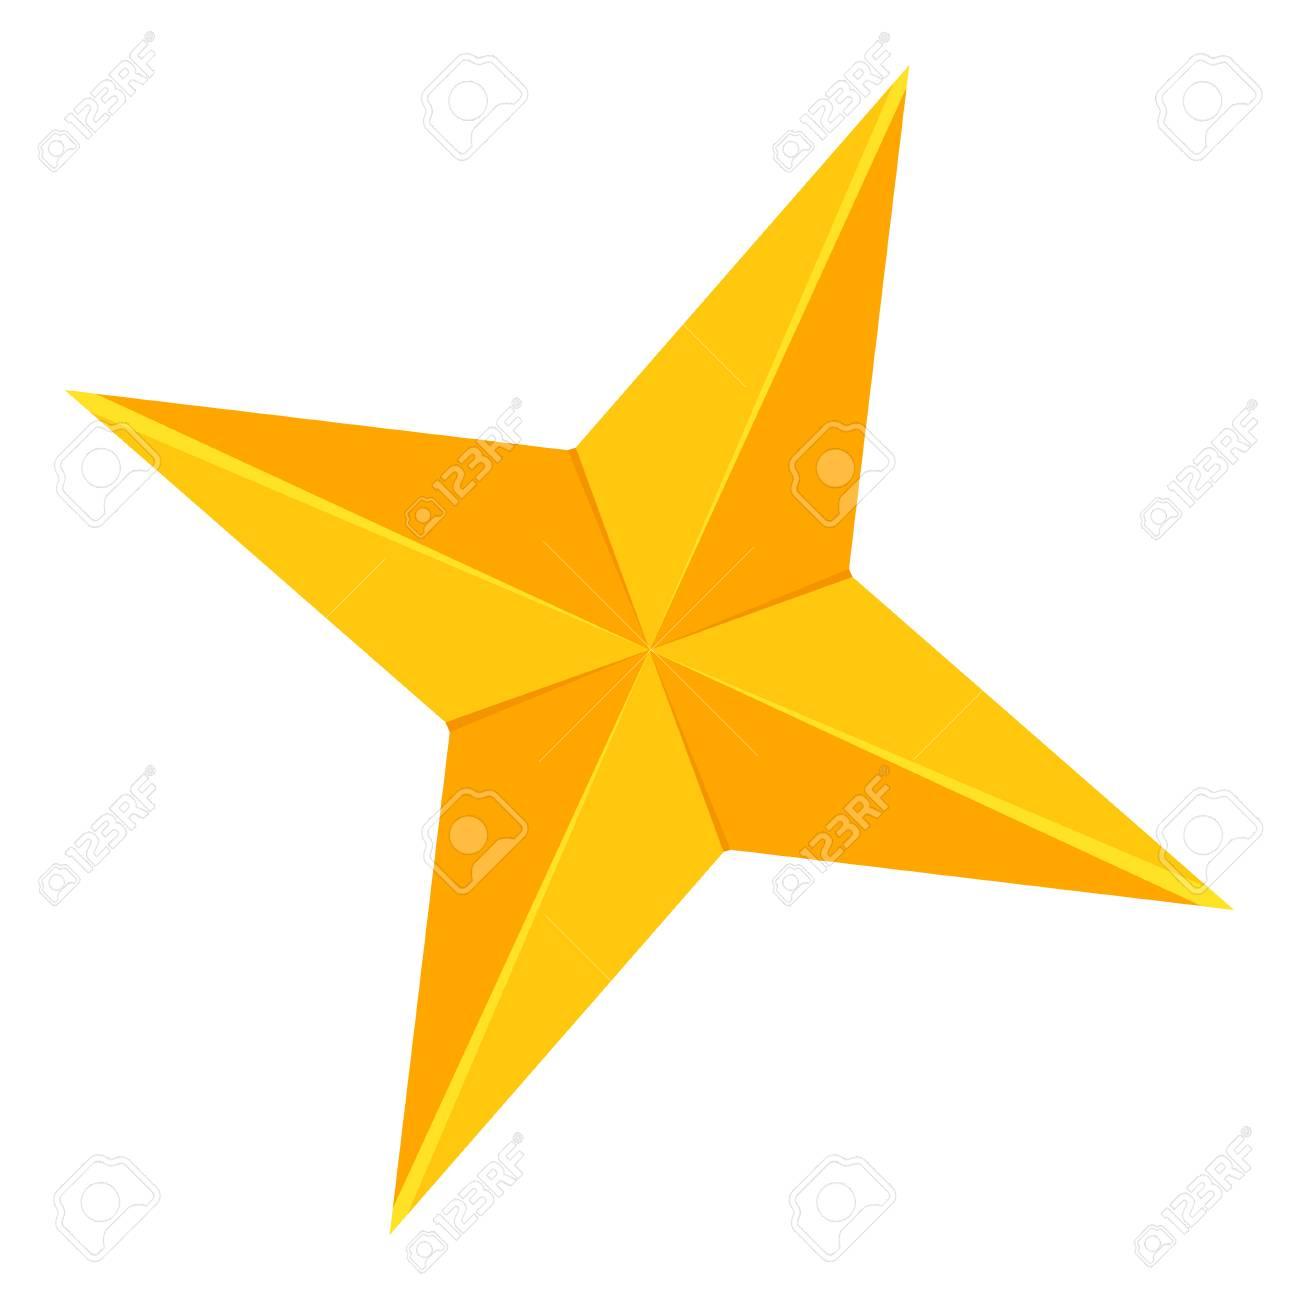 Colorful Cartoon 4 Point Golden Star Xmas Tree Decoration Symbol